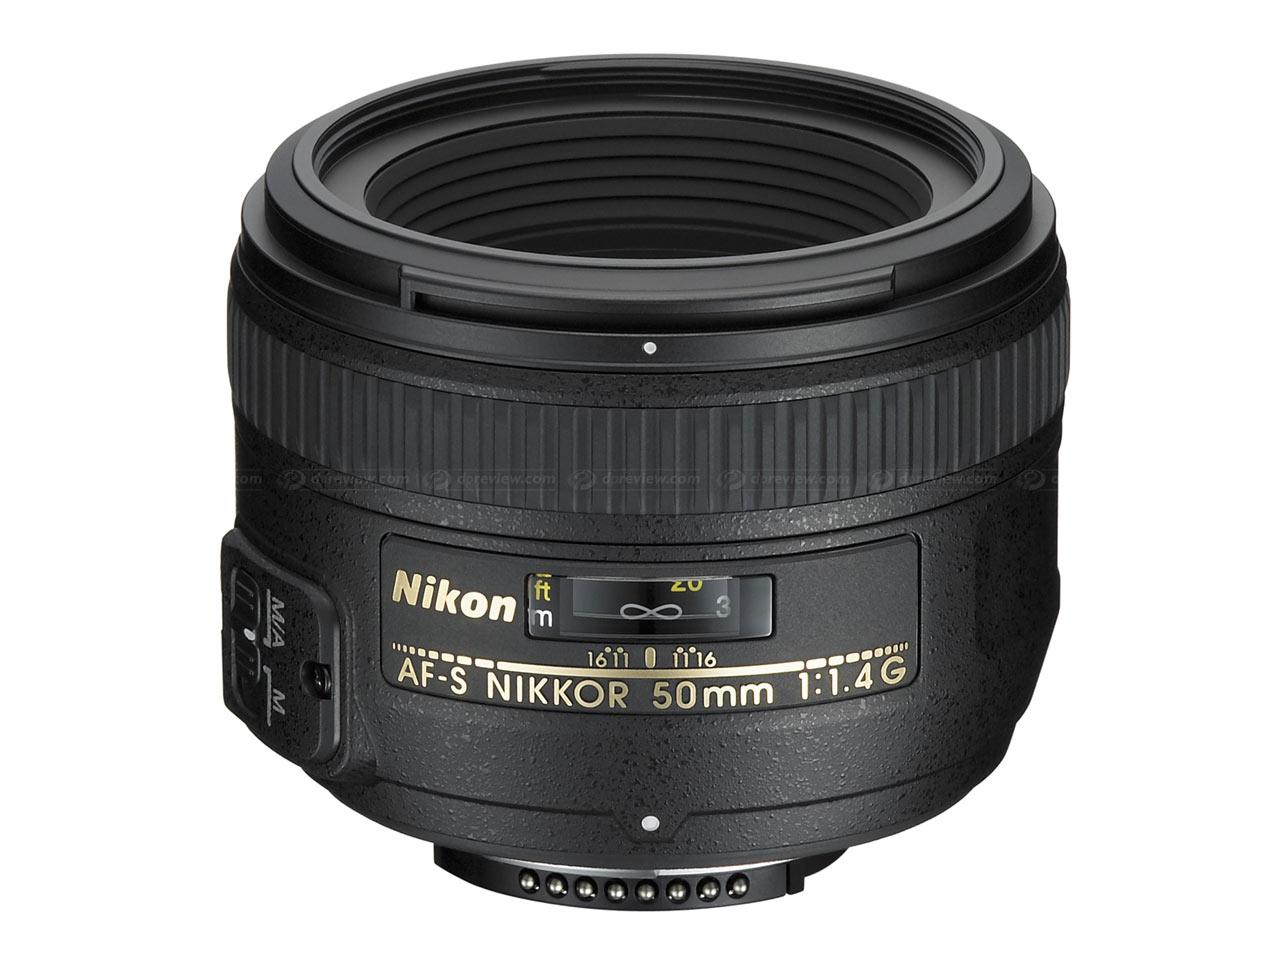 Nikon AF-S Nikkor 50mm f/1.4G, semplicemente irrinunciabile